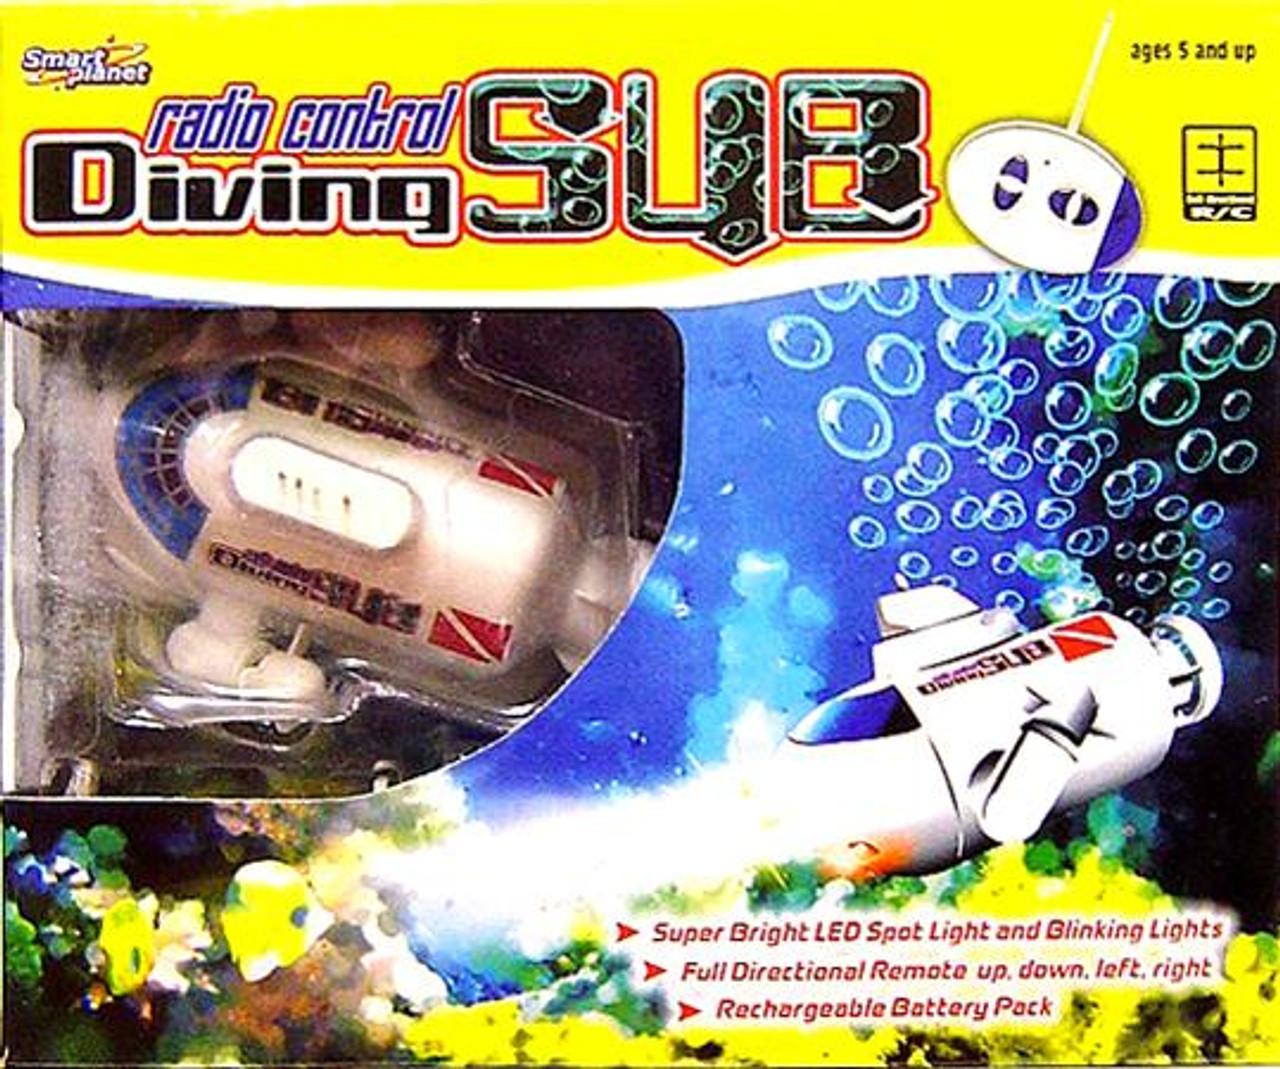 Radio Control Driving Sub R/C Vehicle